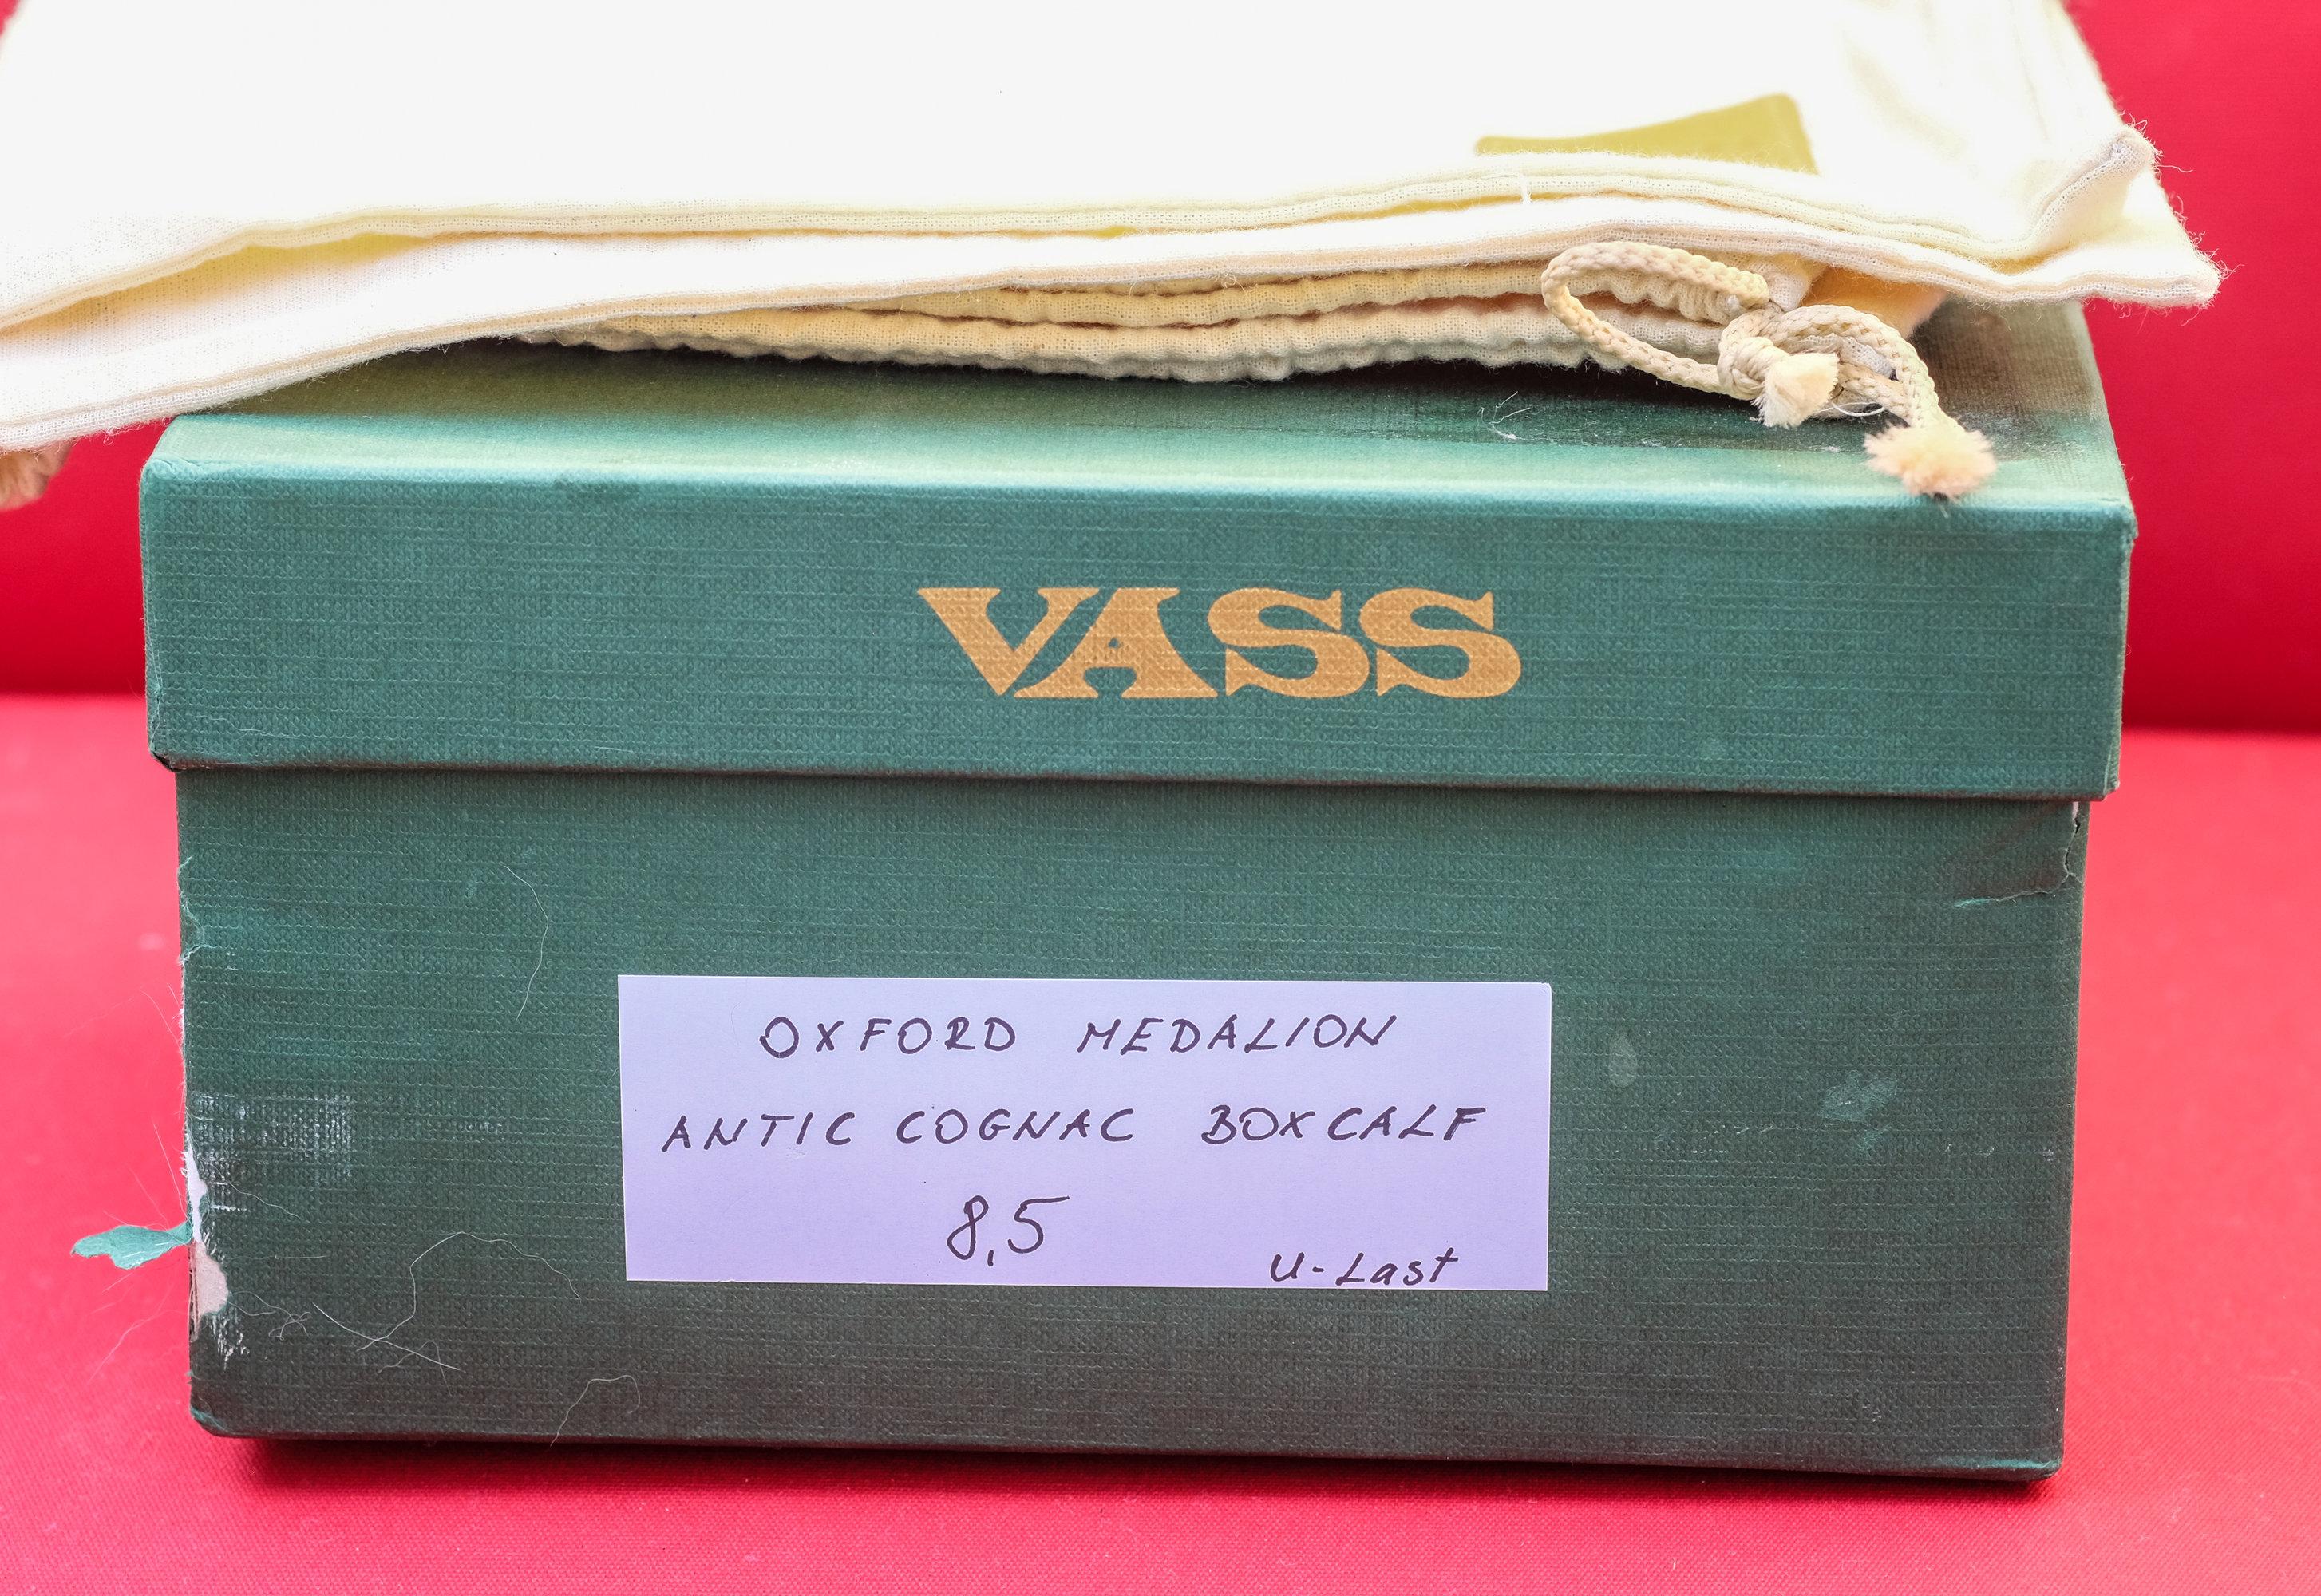 Vass Oxford w Medallion in Antic Cognac Box Calf.jpg